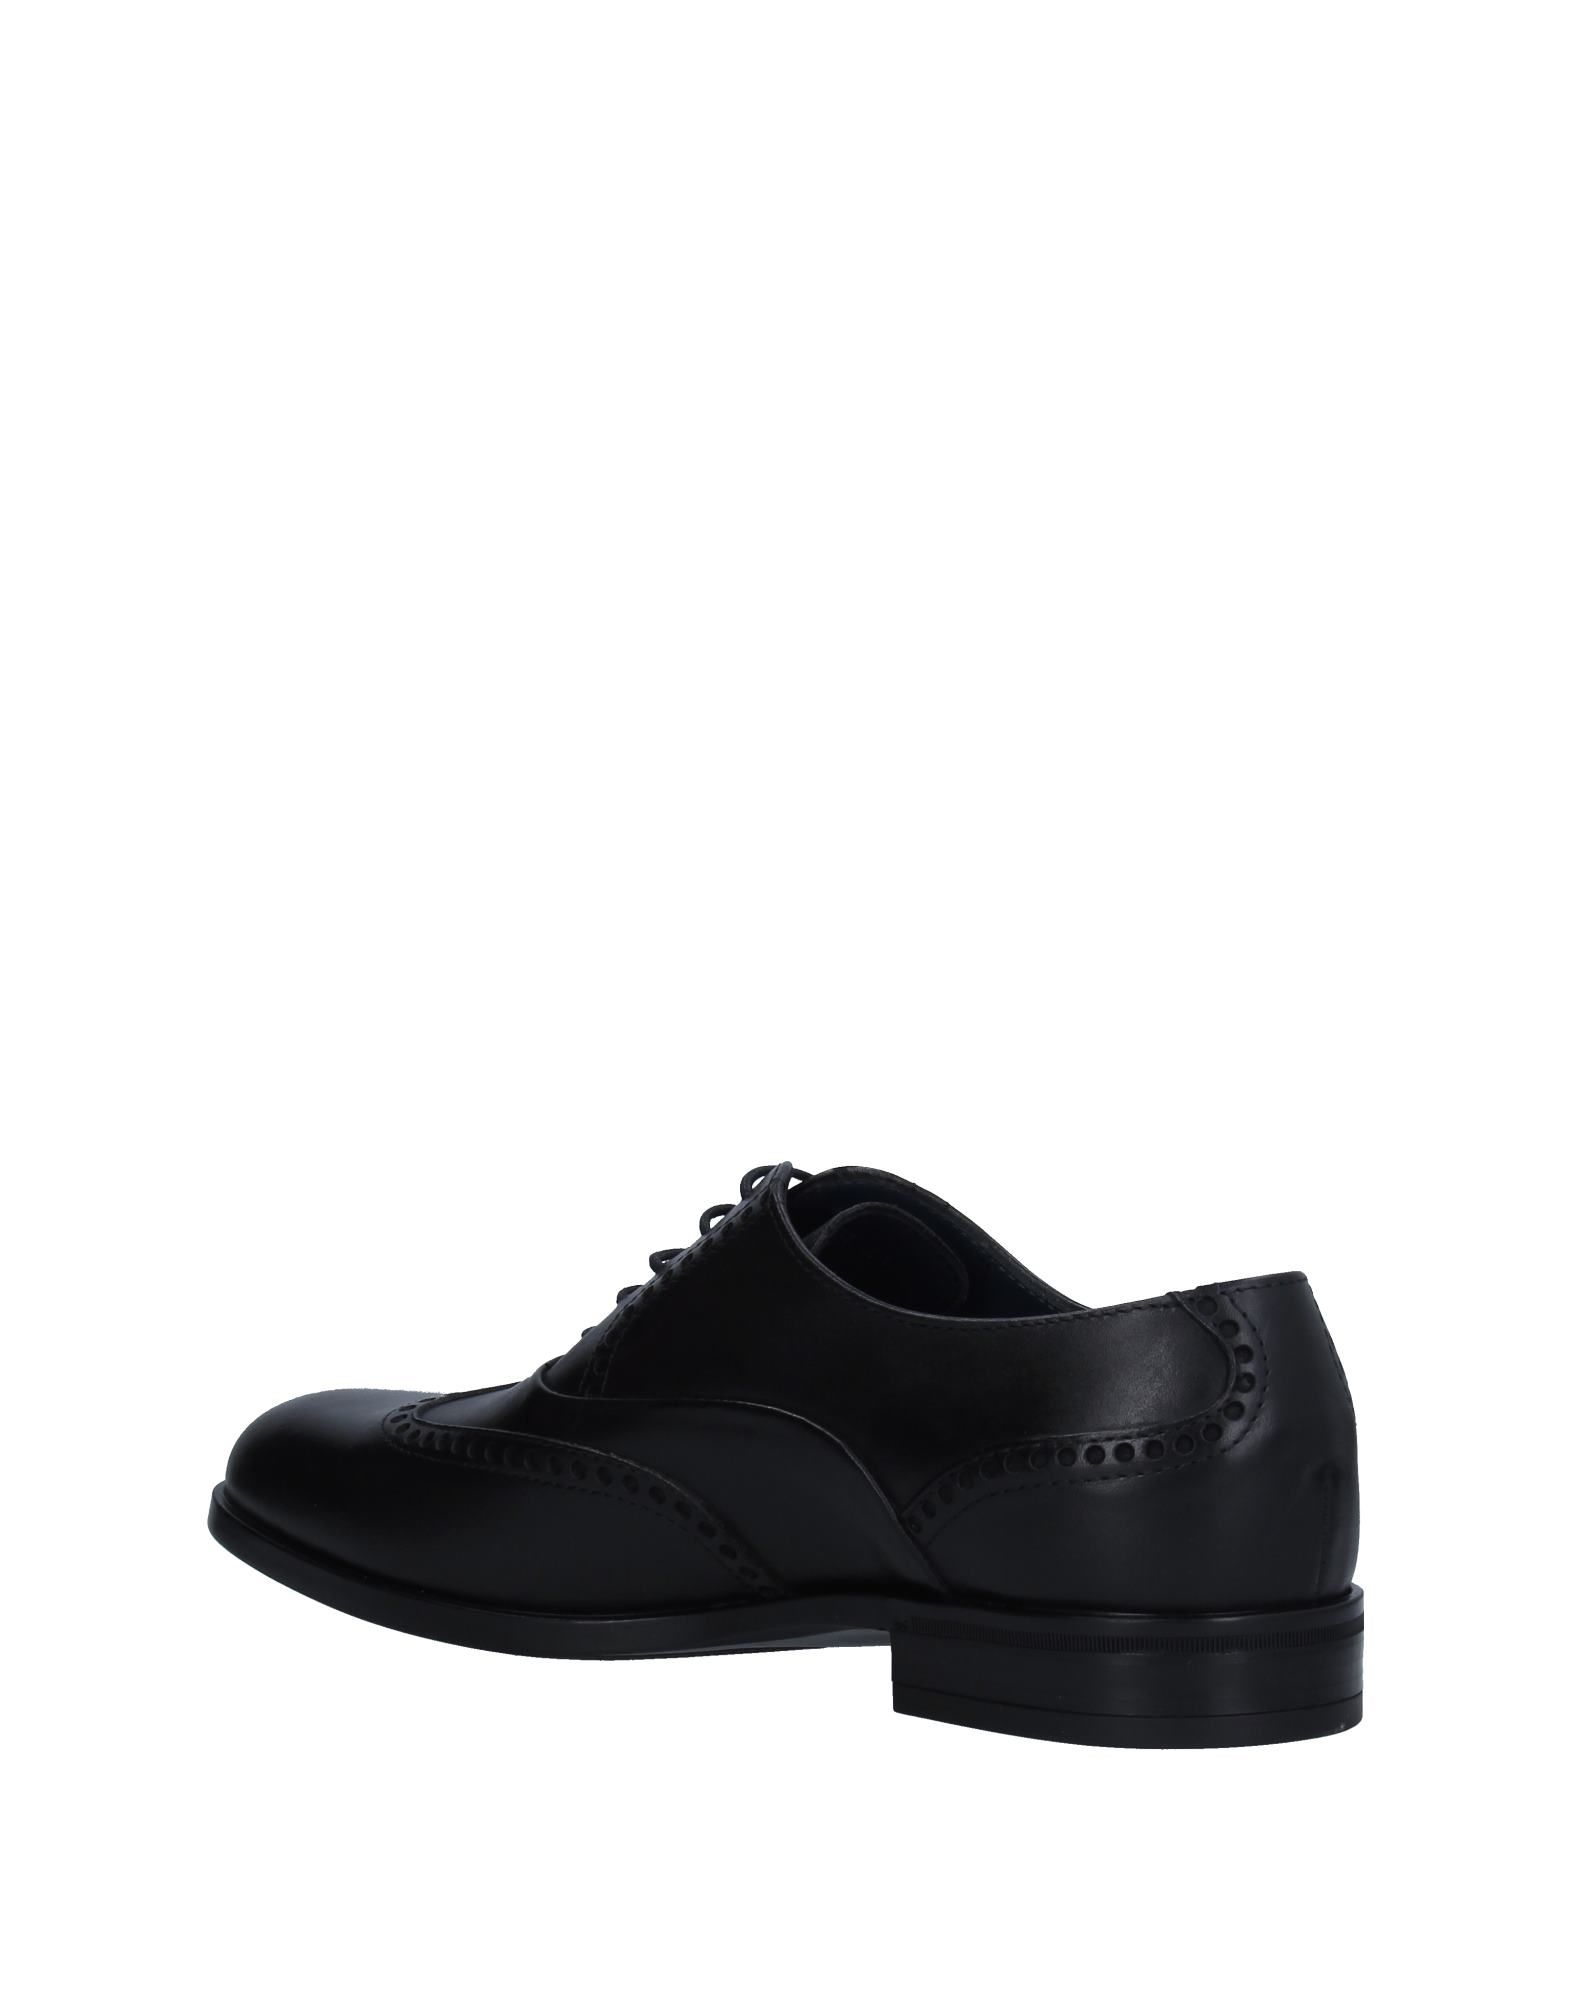 Fabiano Ricci Schnürschuhe Herren  Schuhe 11316643WM Gute Qualität beliebte Schuhe  bfe07a